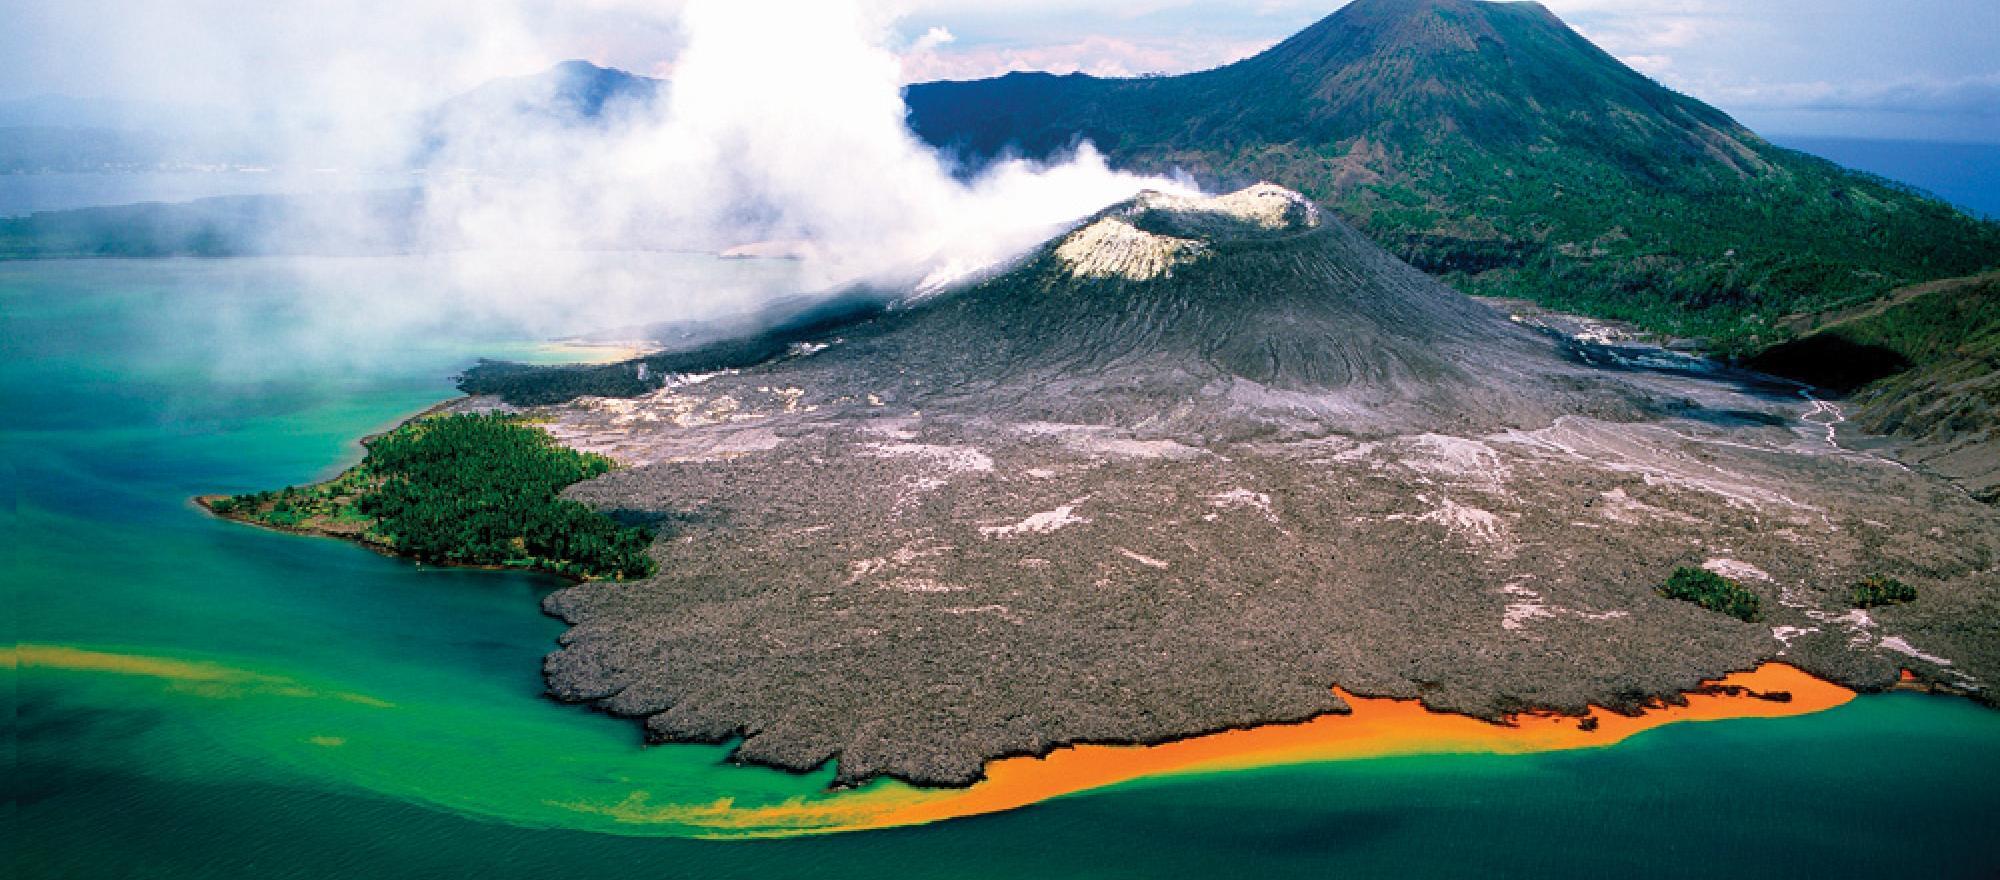 Reimagine Papua New Guinea Papua New Guinea